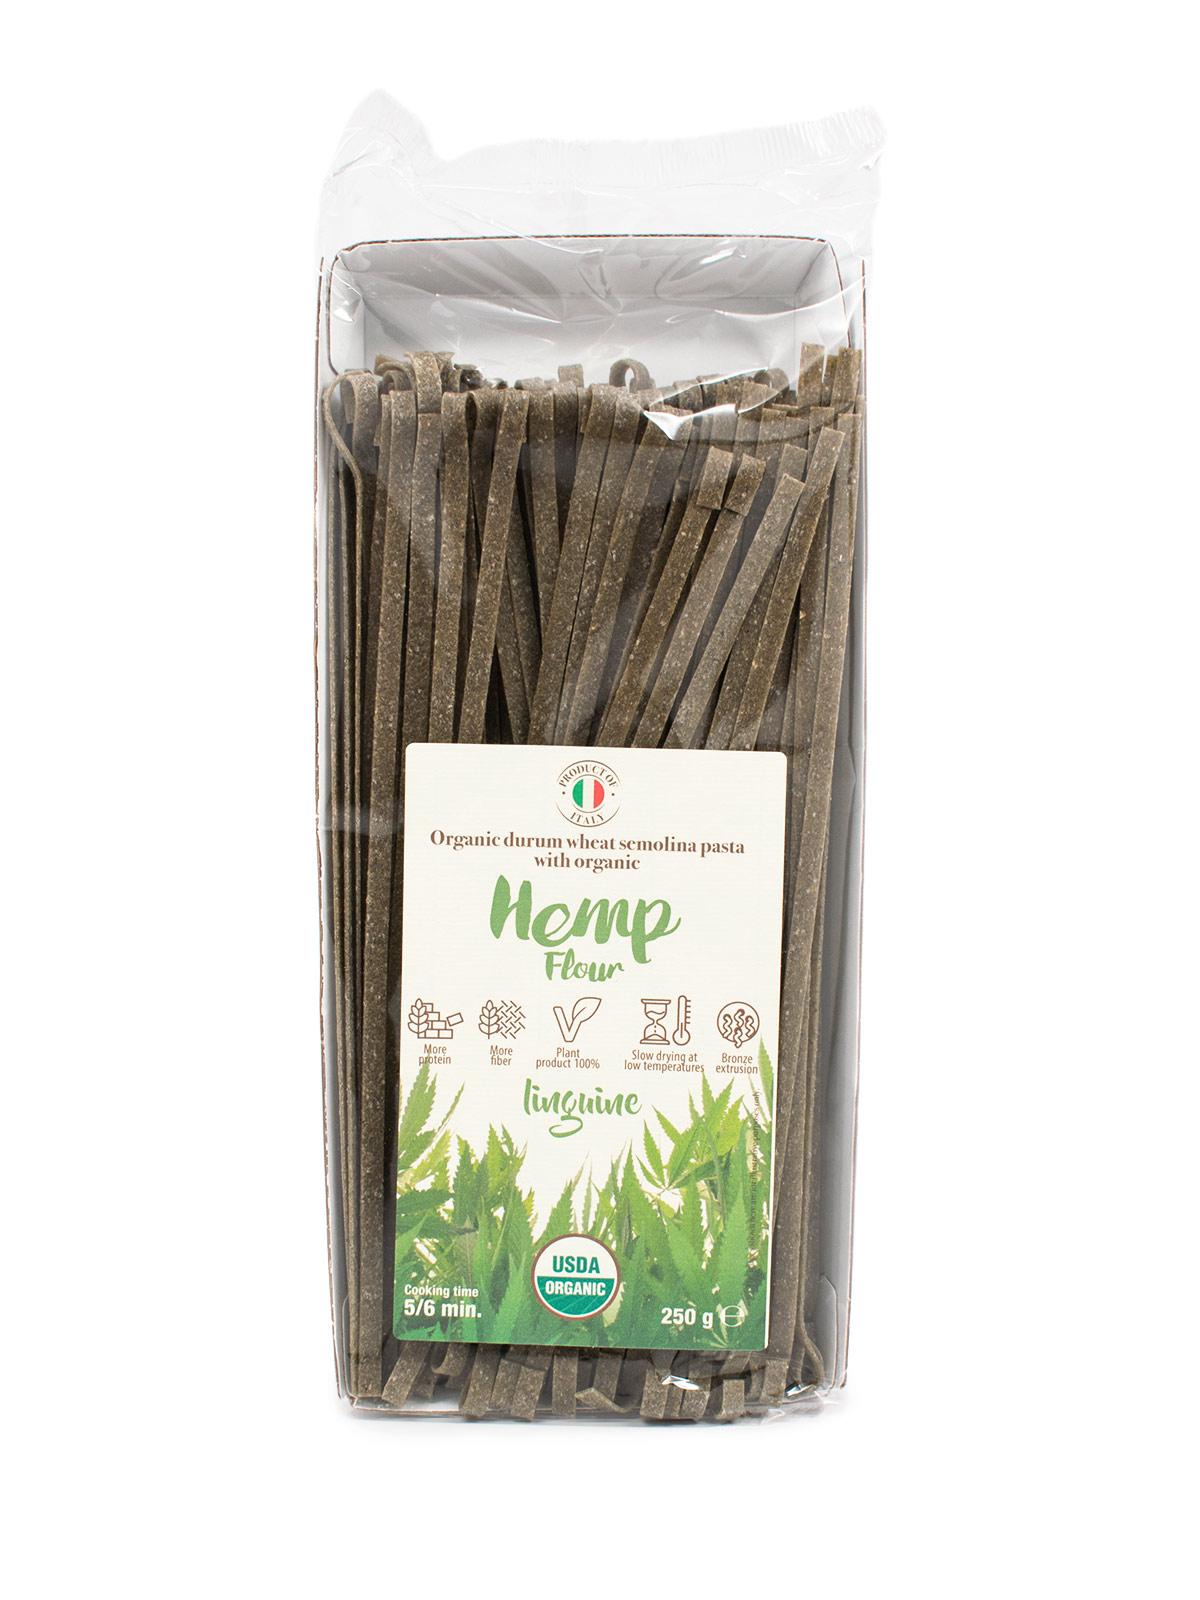 Linguine with Organic Hemp Flour - Pastas, Rice, and Grains - Buon'Italia